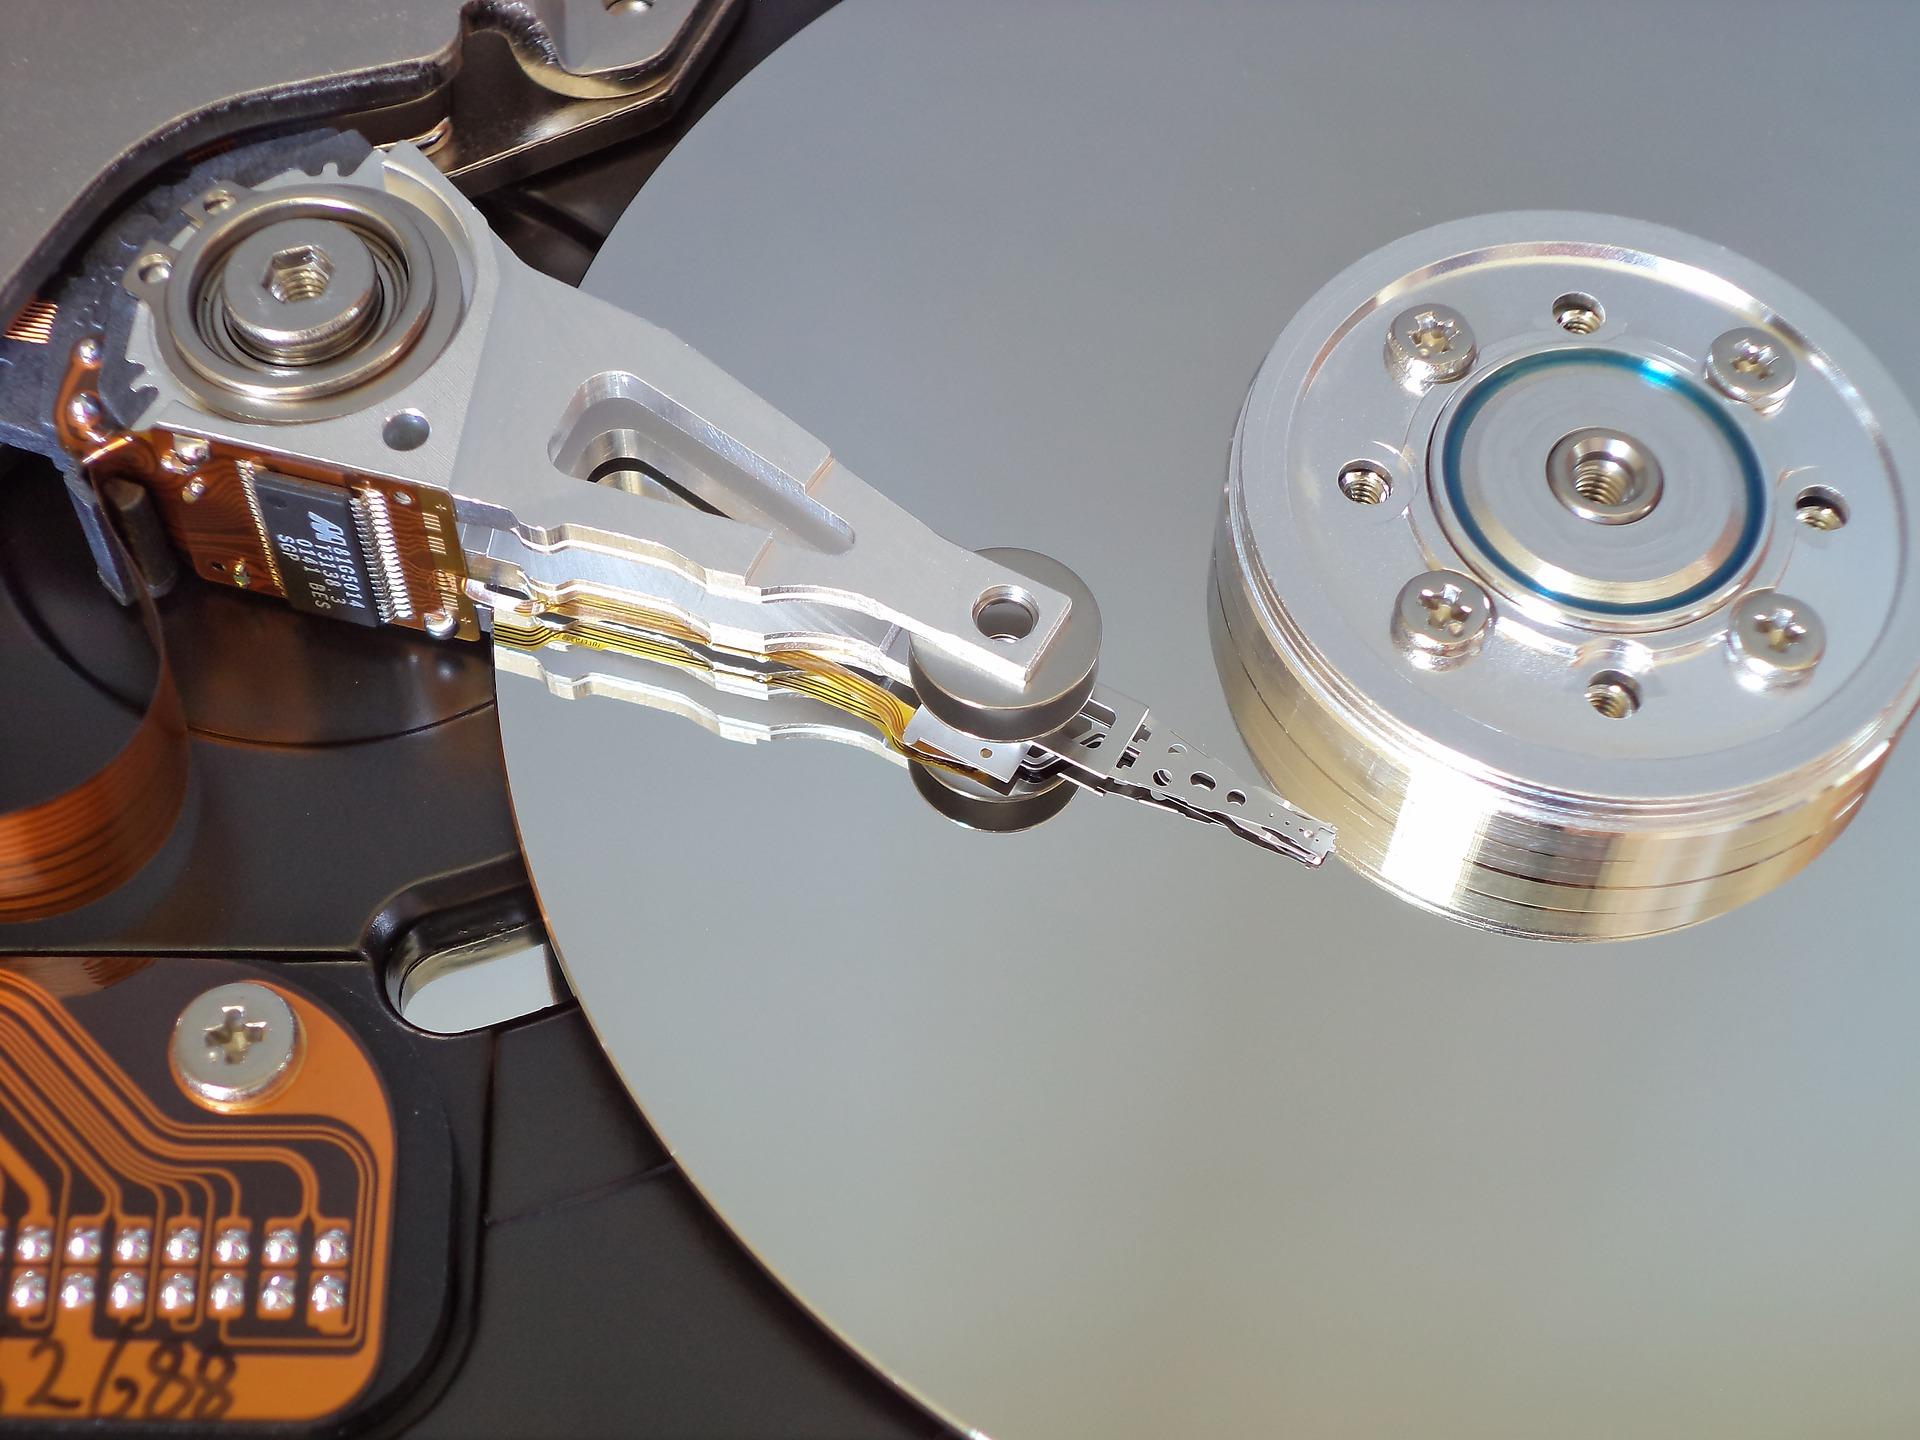 hard-disk-1643762_1920.jpg